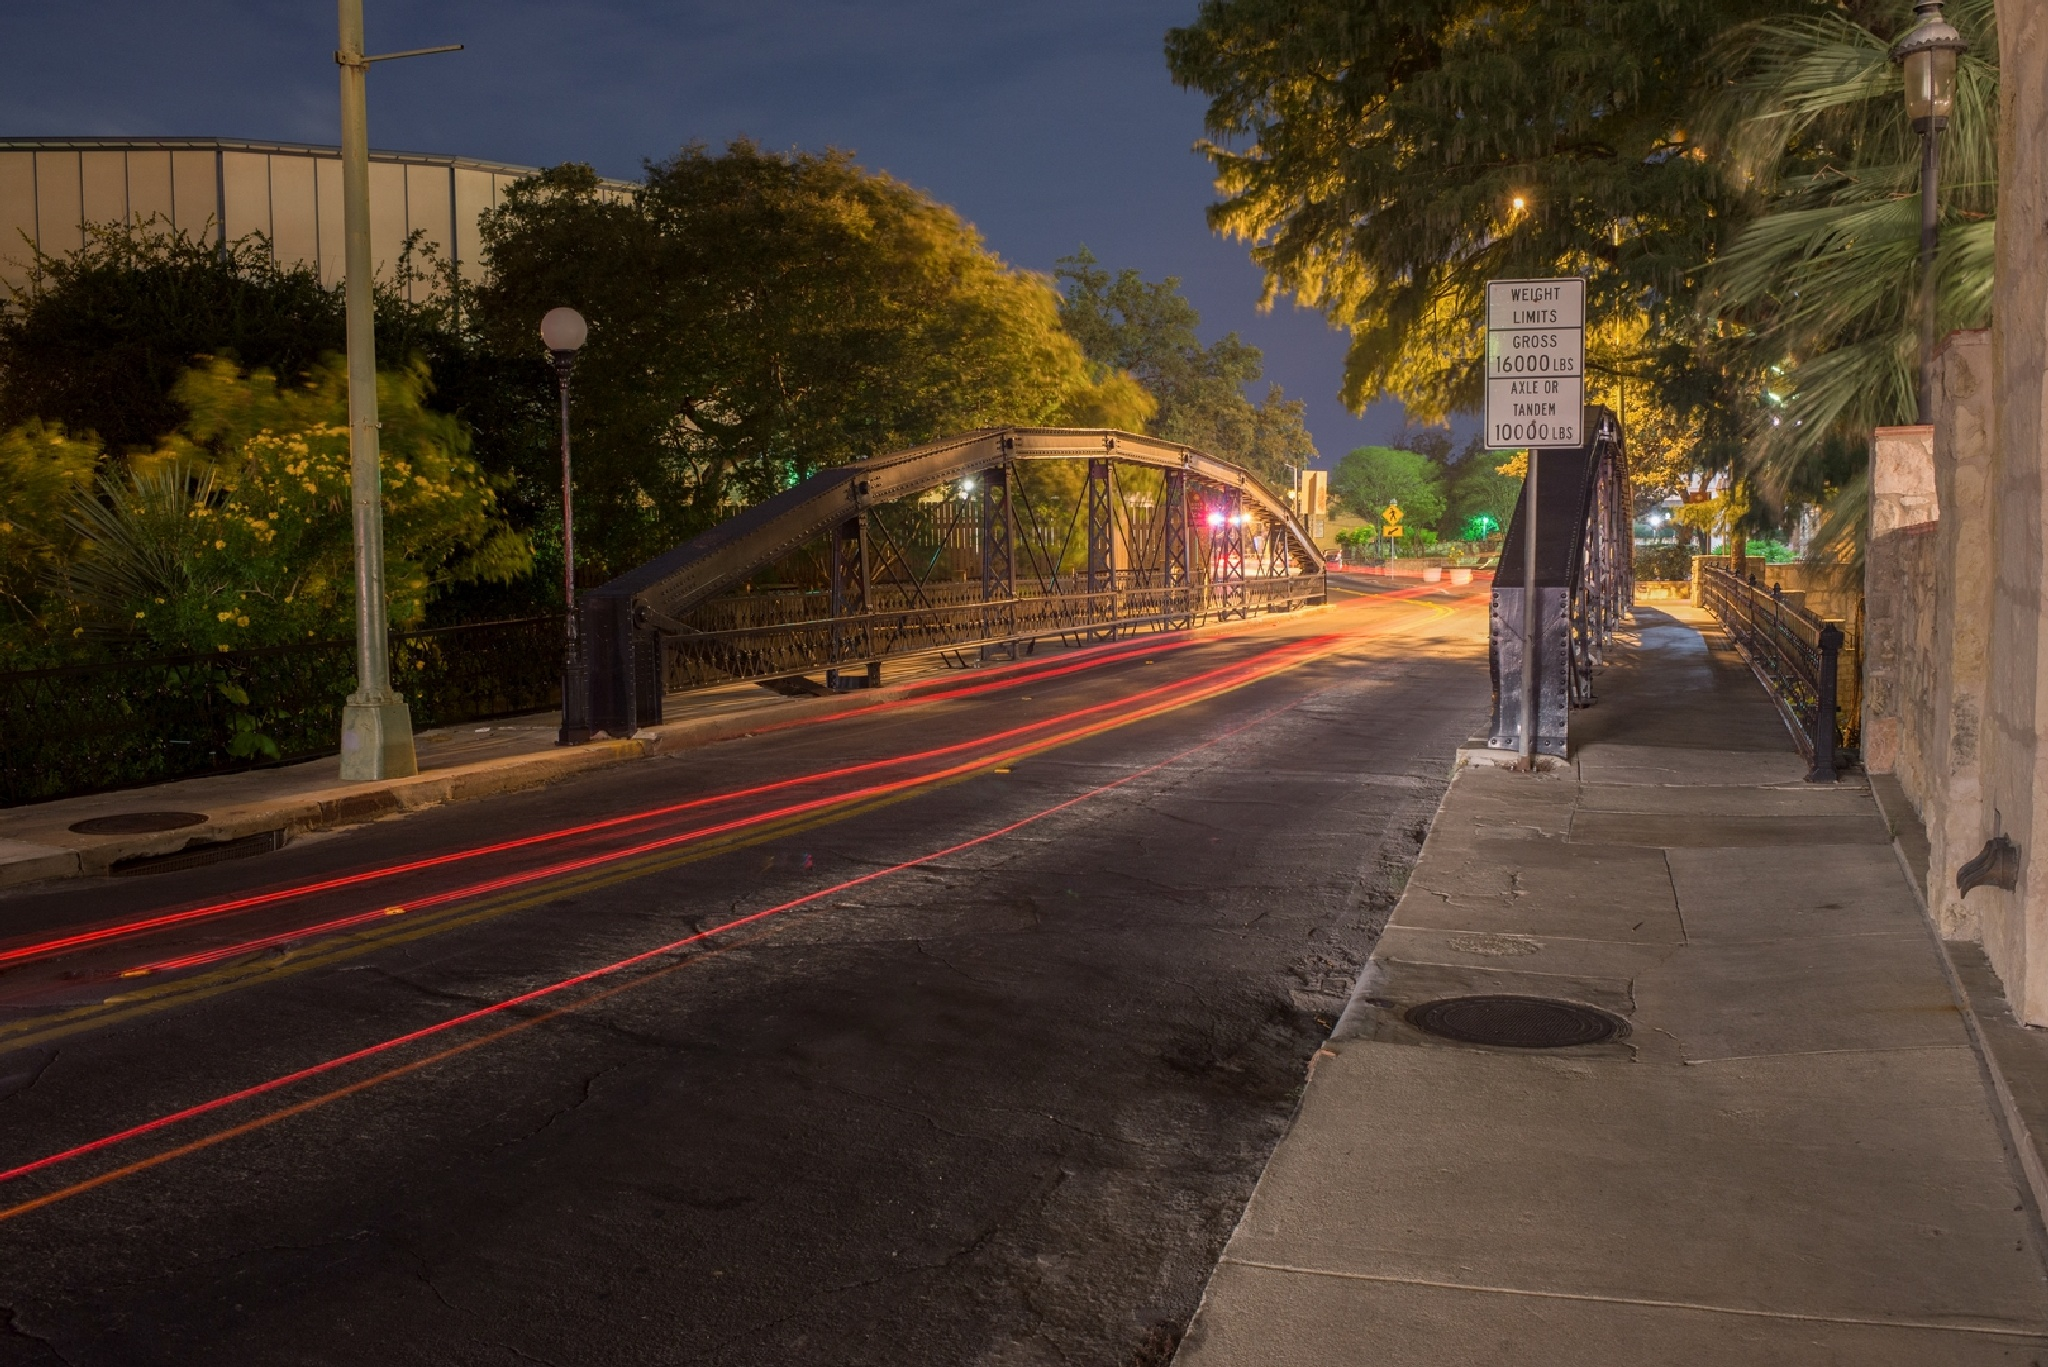 Night Bridge by Dealsnphotos